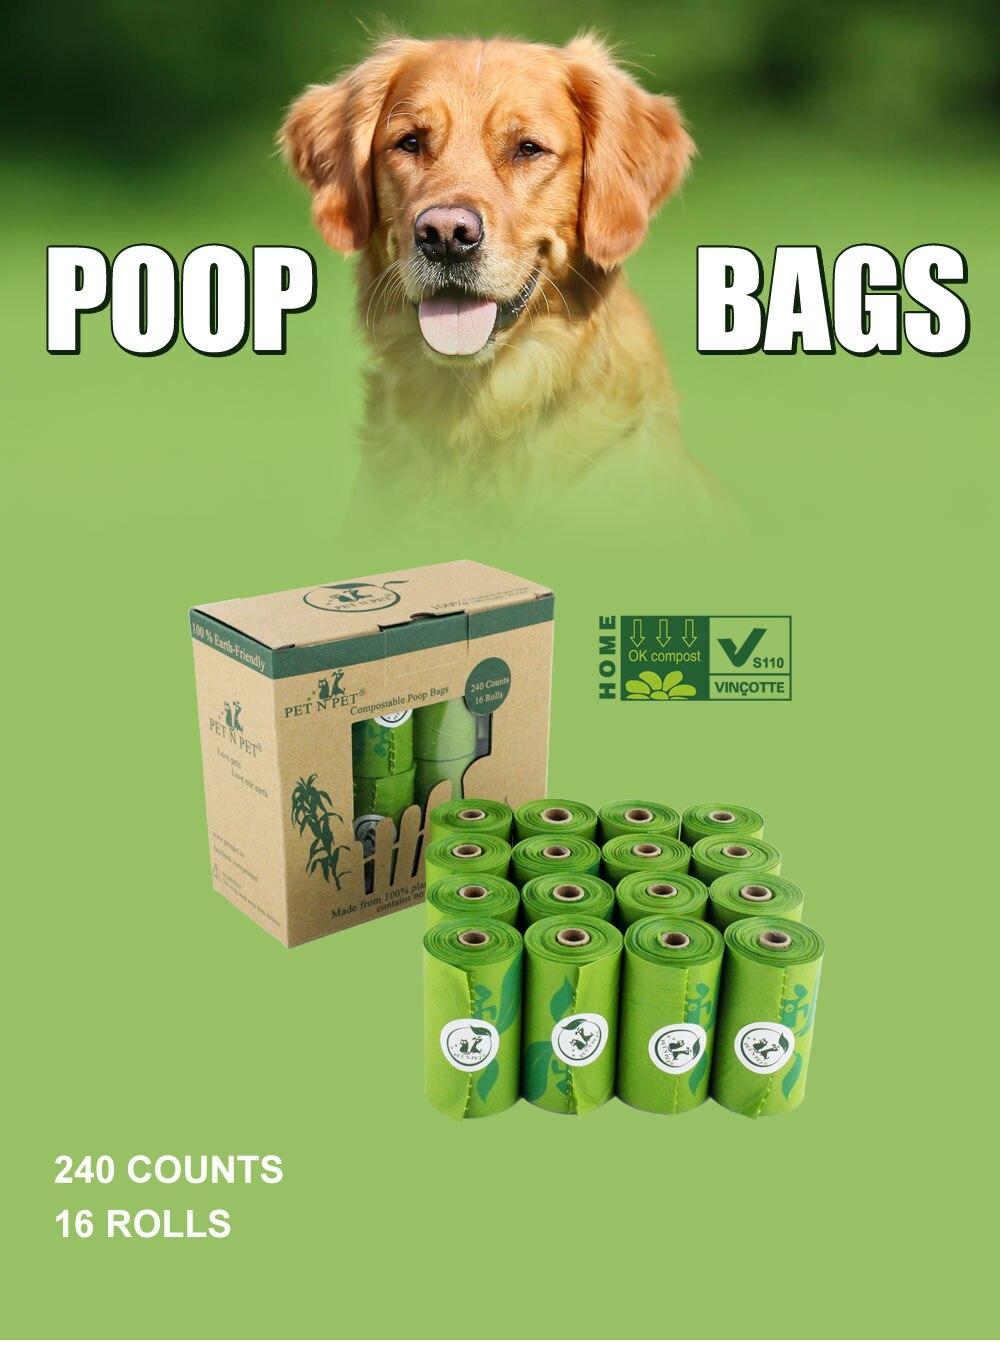 Earth Friendly Biodegradable Pet Poop Bags 46 » Pets Impress